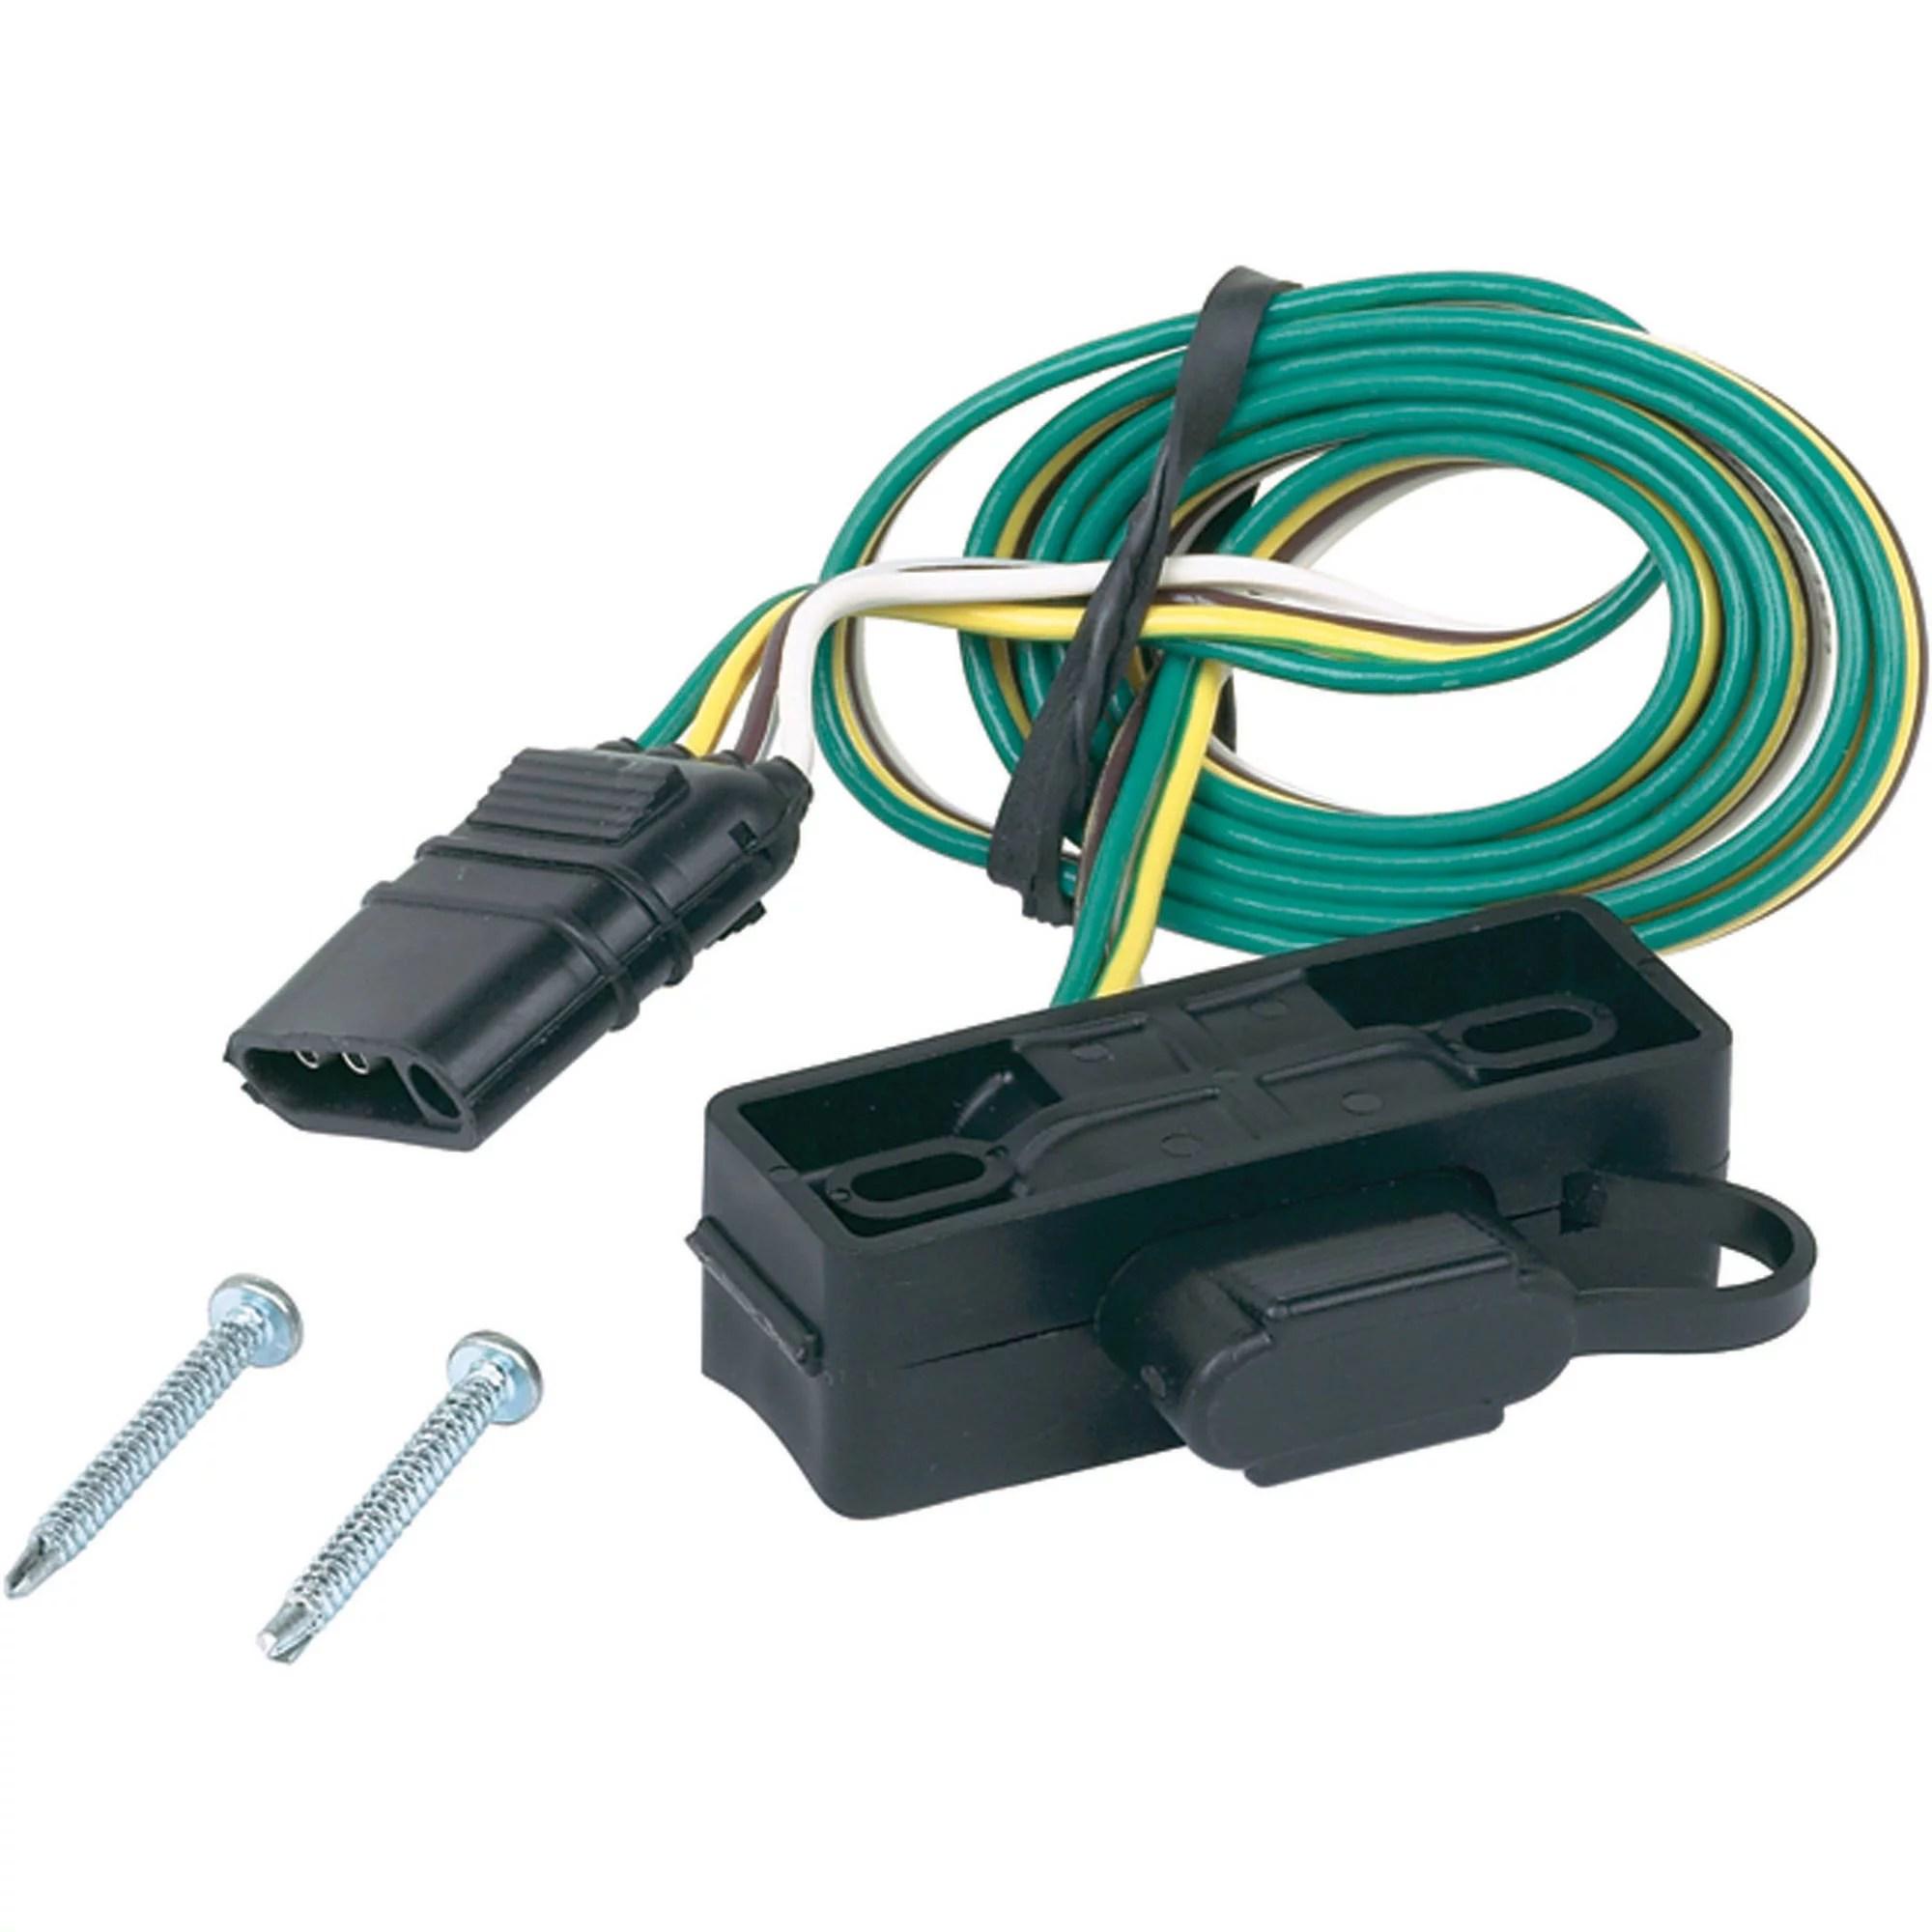 hight resolution of hopkins 4 wire flat mounting bracket walmart com4 way wiring bracket 11